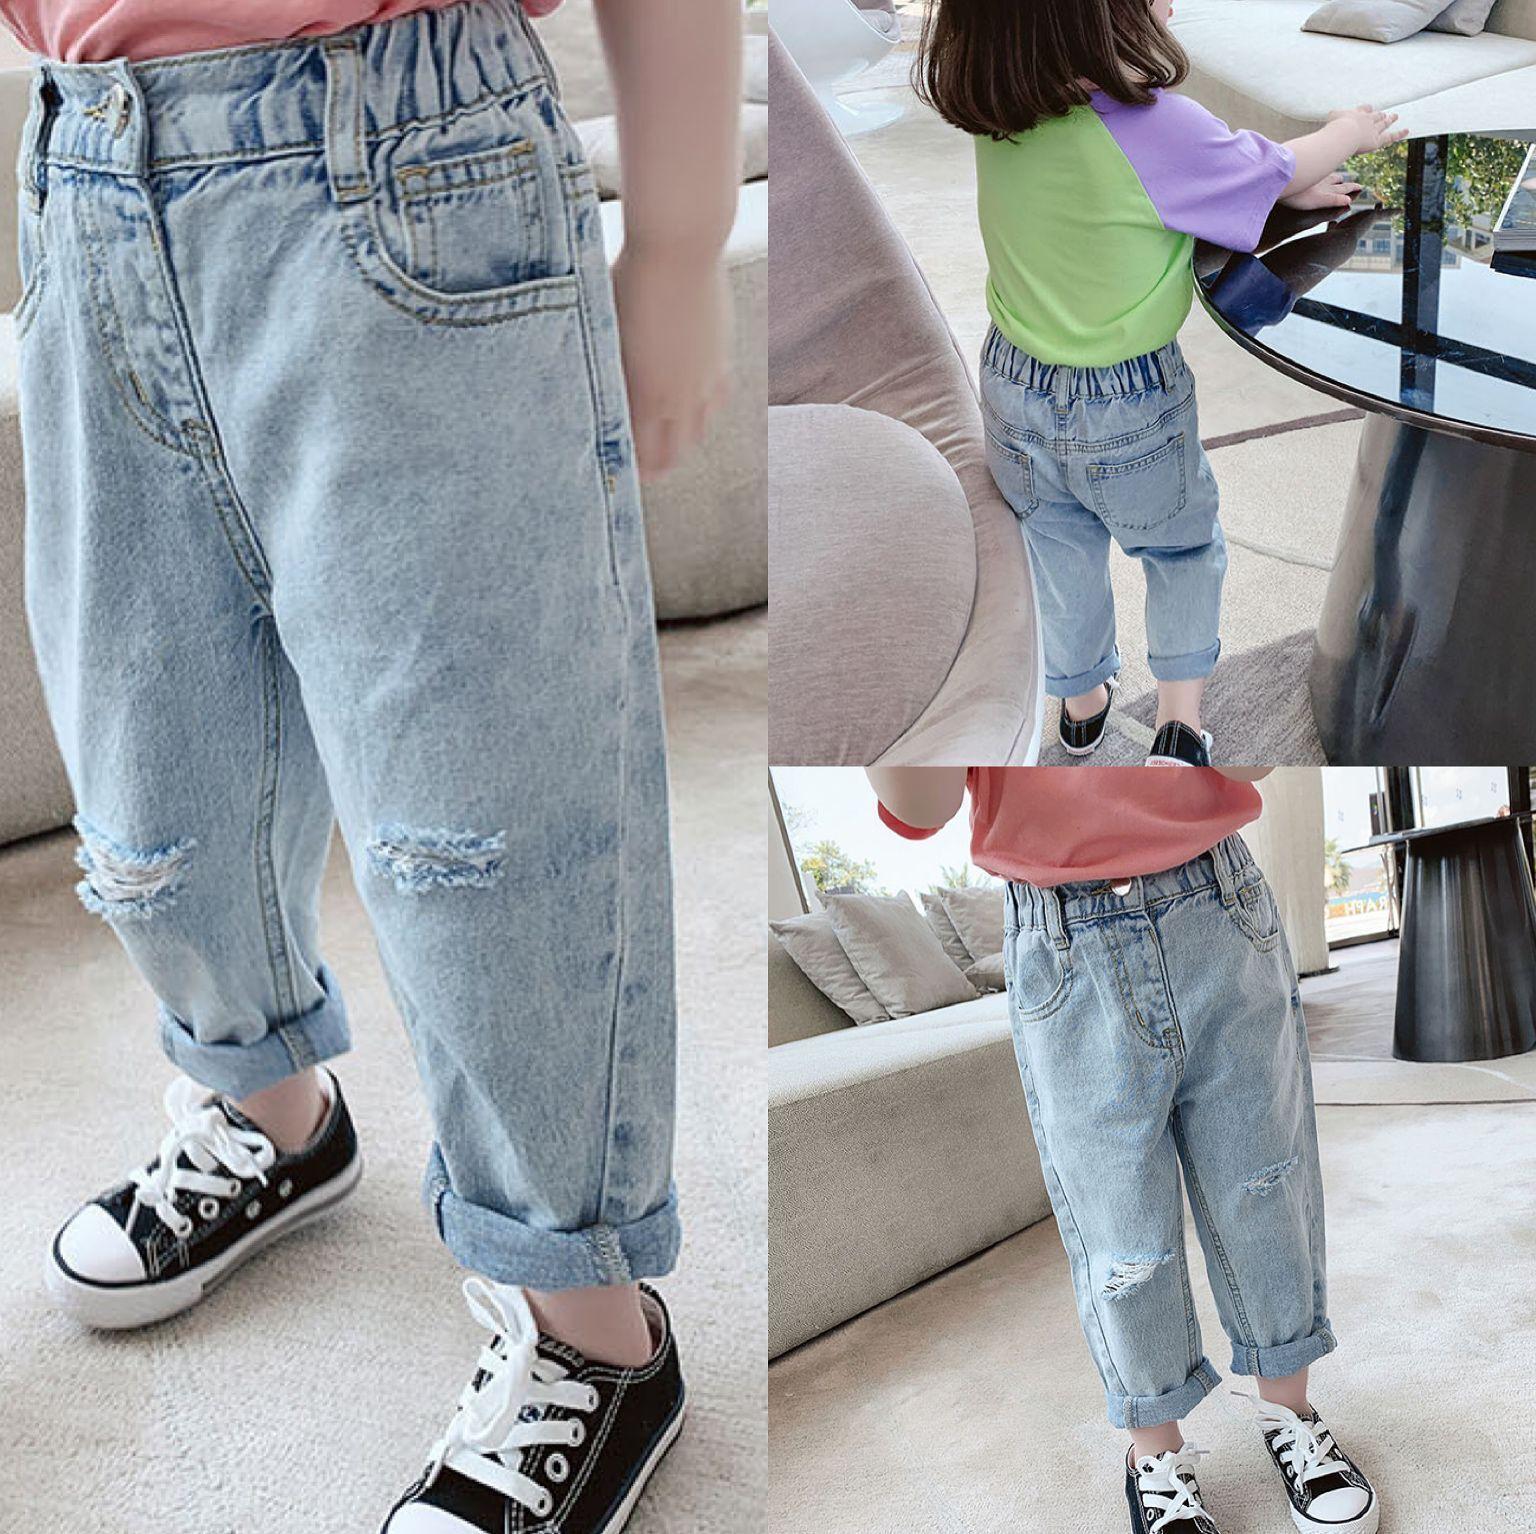 TG Korean INS Spring Summer Kids Girls Jeans Trousers Quality Elastic Waist Autumn Children Hole Pants